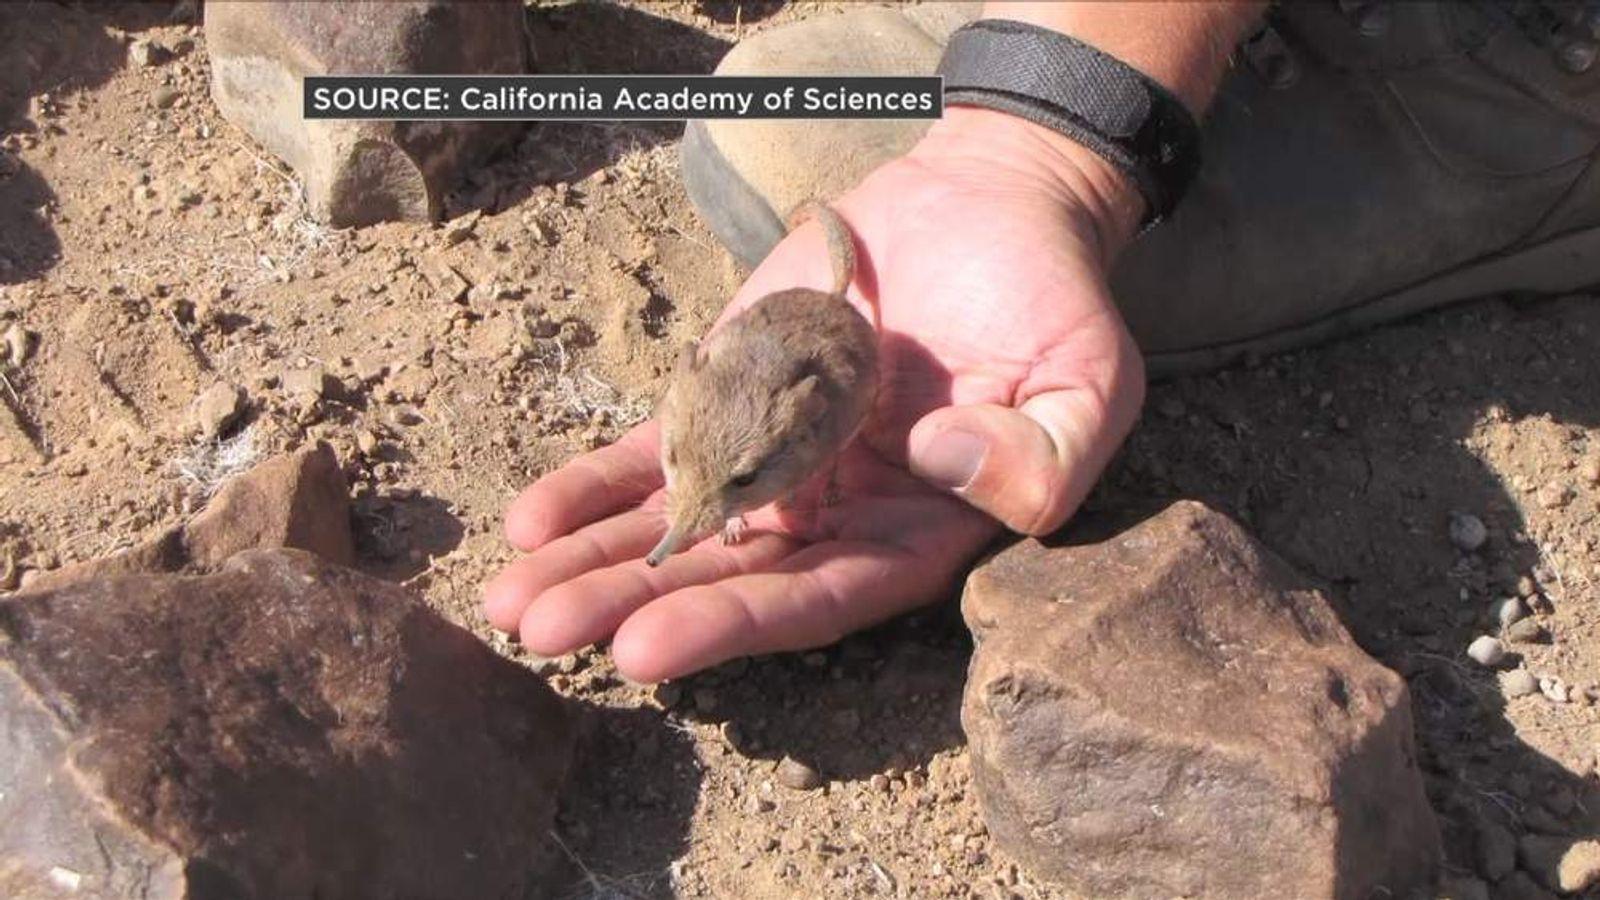 New elephant shrew species discovered